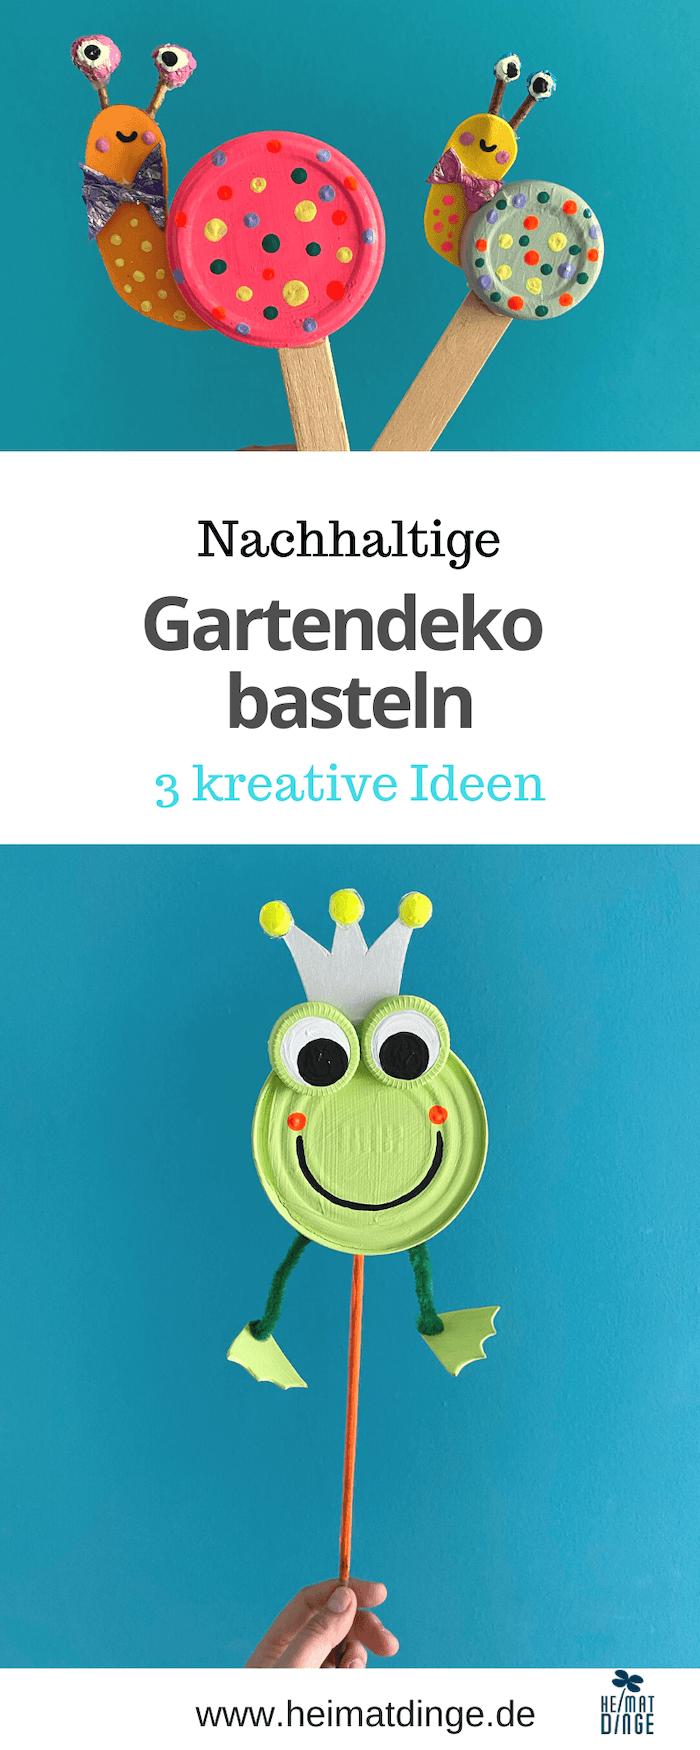 Nachhaltige Gartendeko basteln - 3 kreative Ideen